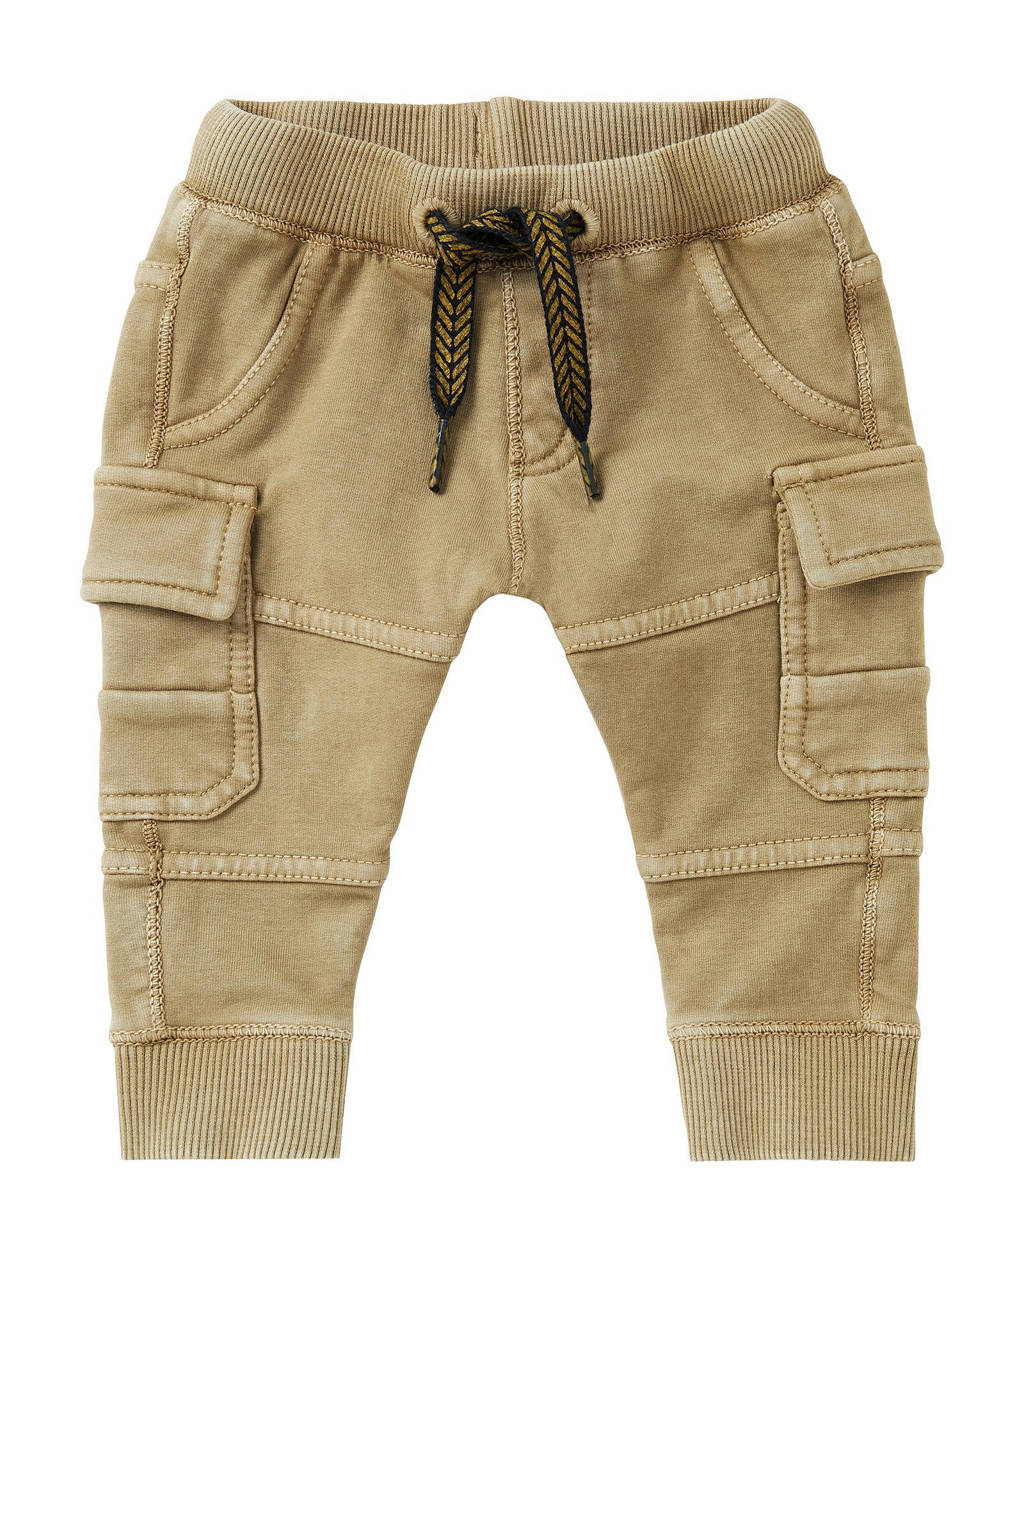 Noppies baby regular fit cargobroek Bisho beige, Beige